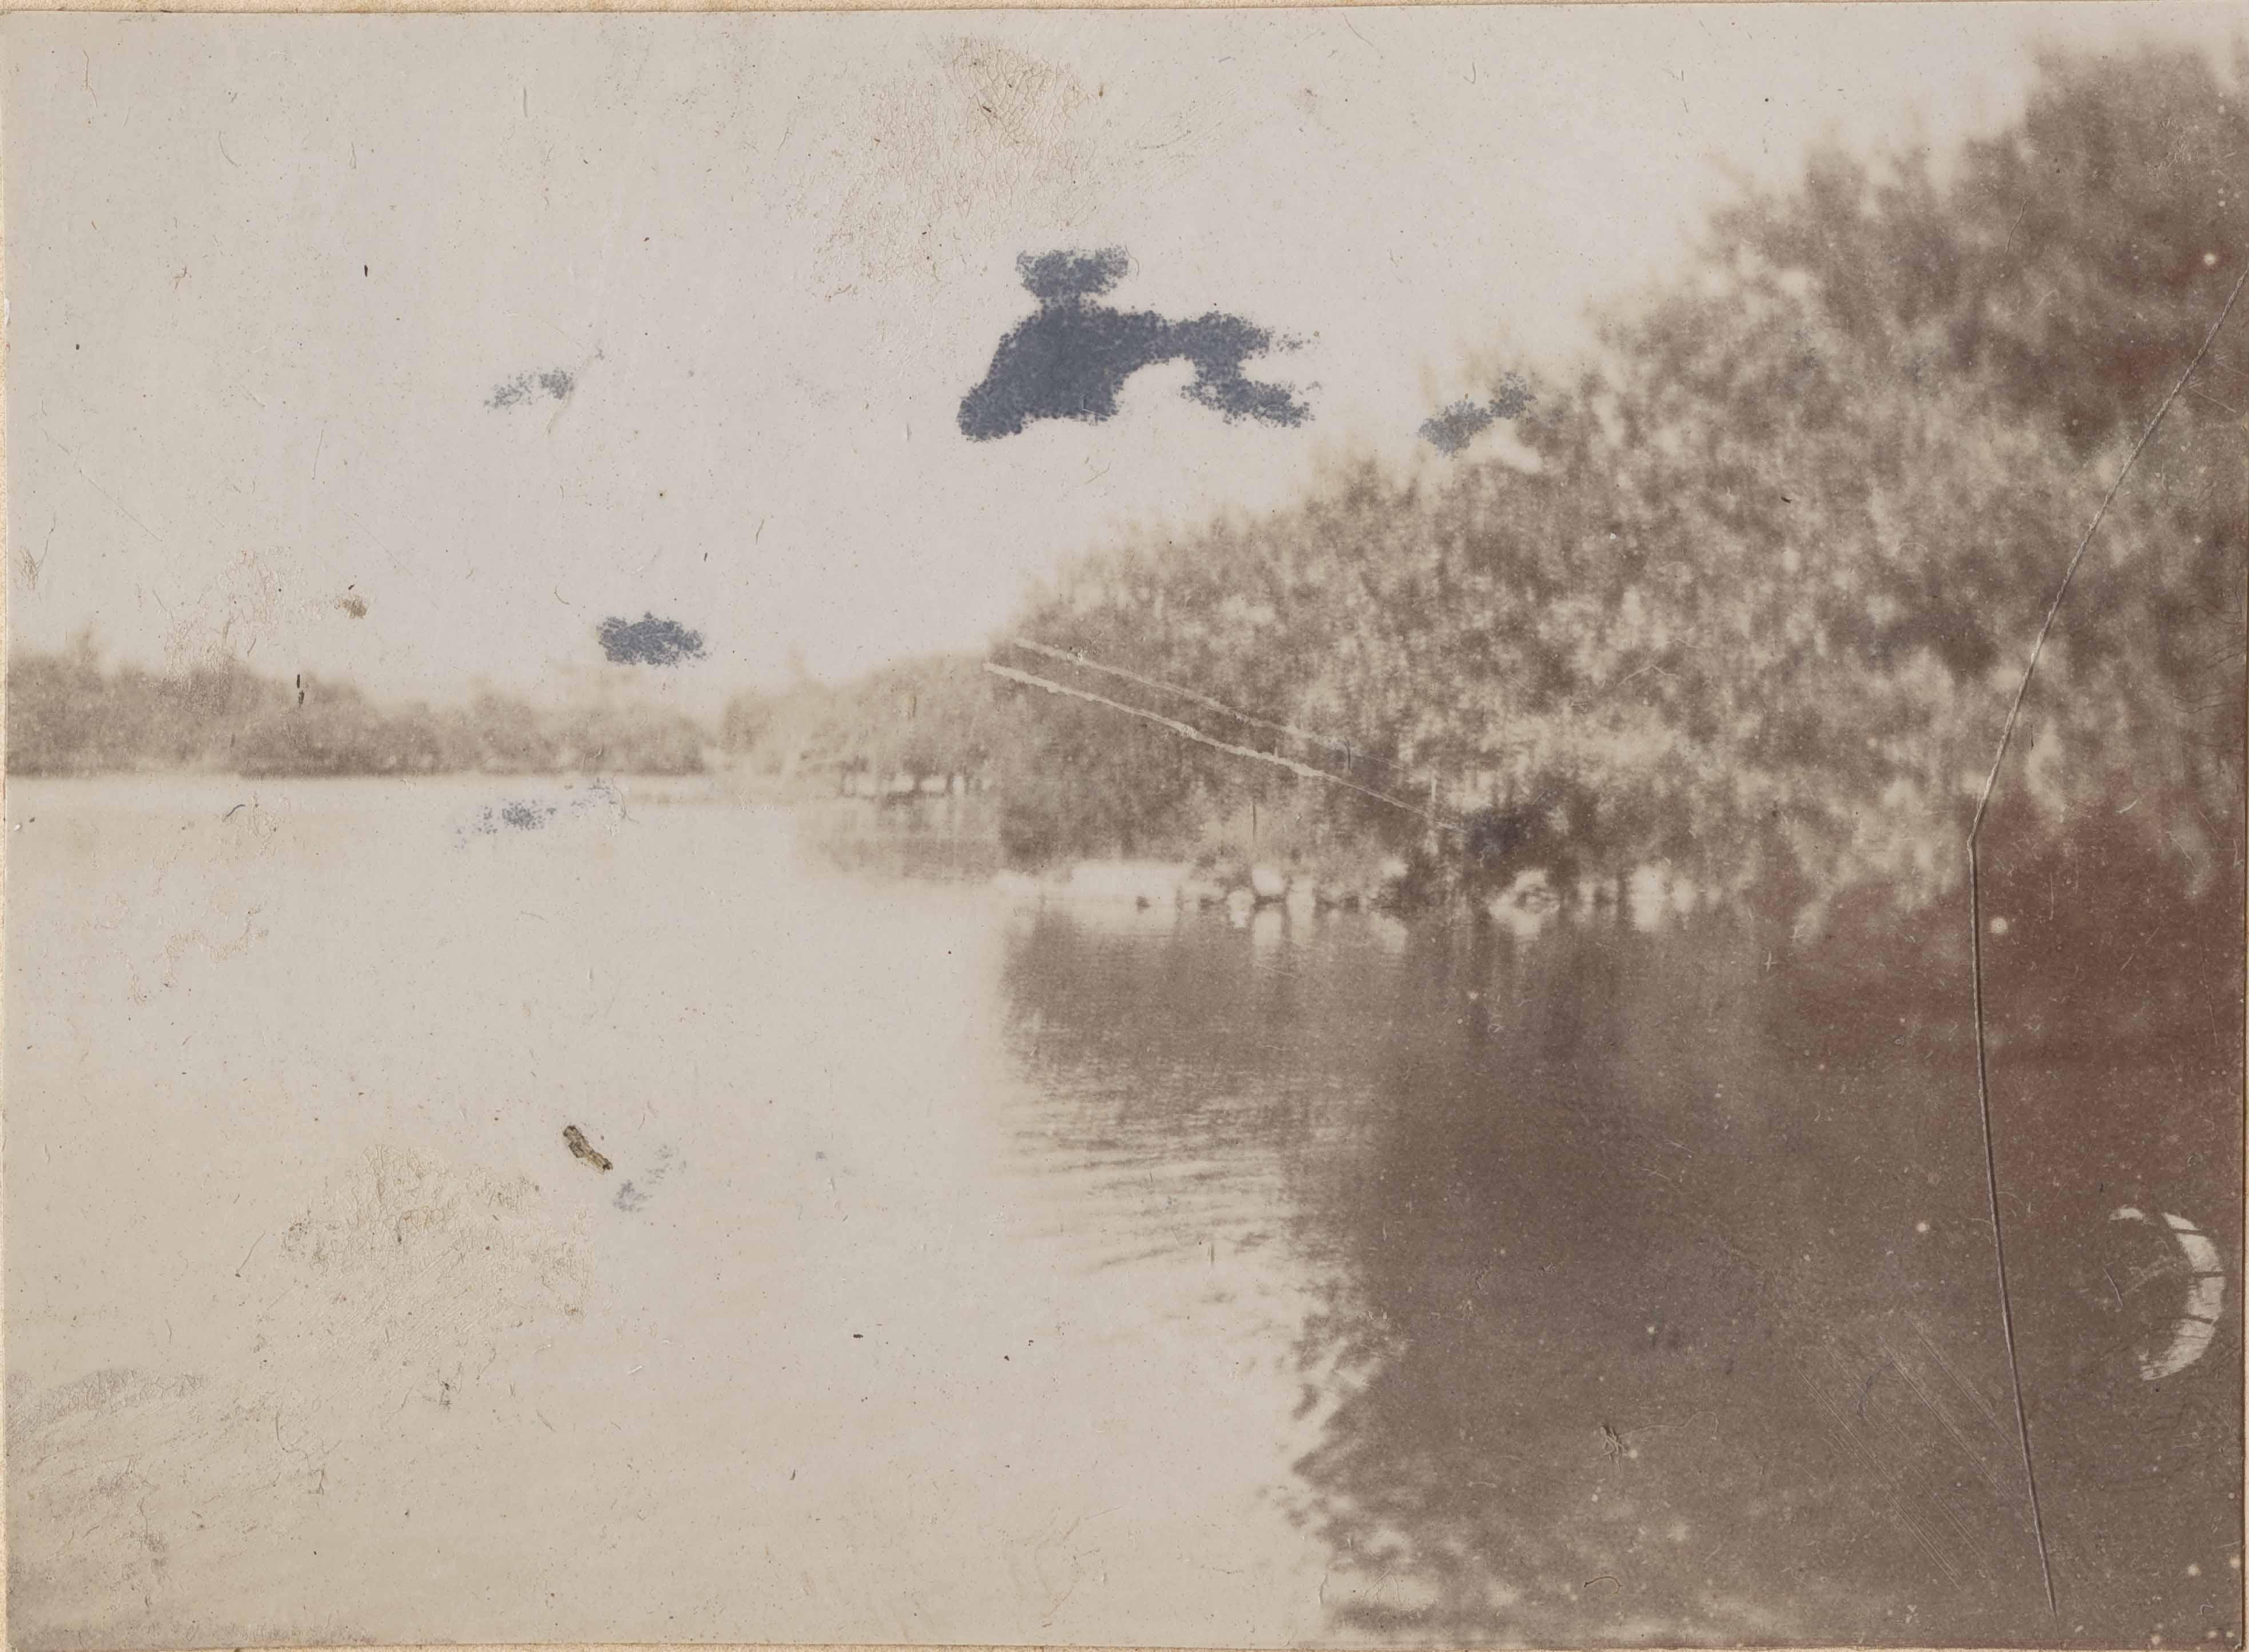 Woodland near body of water